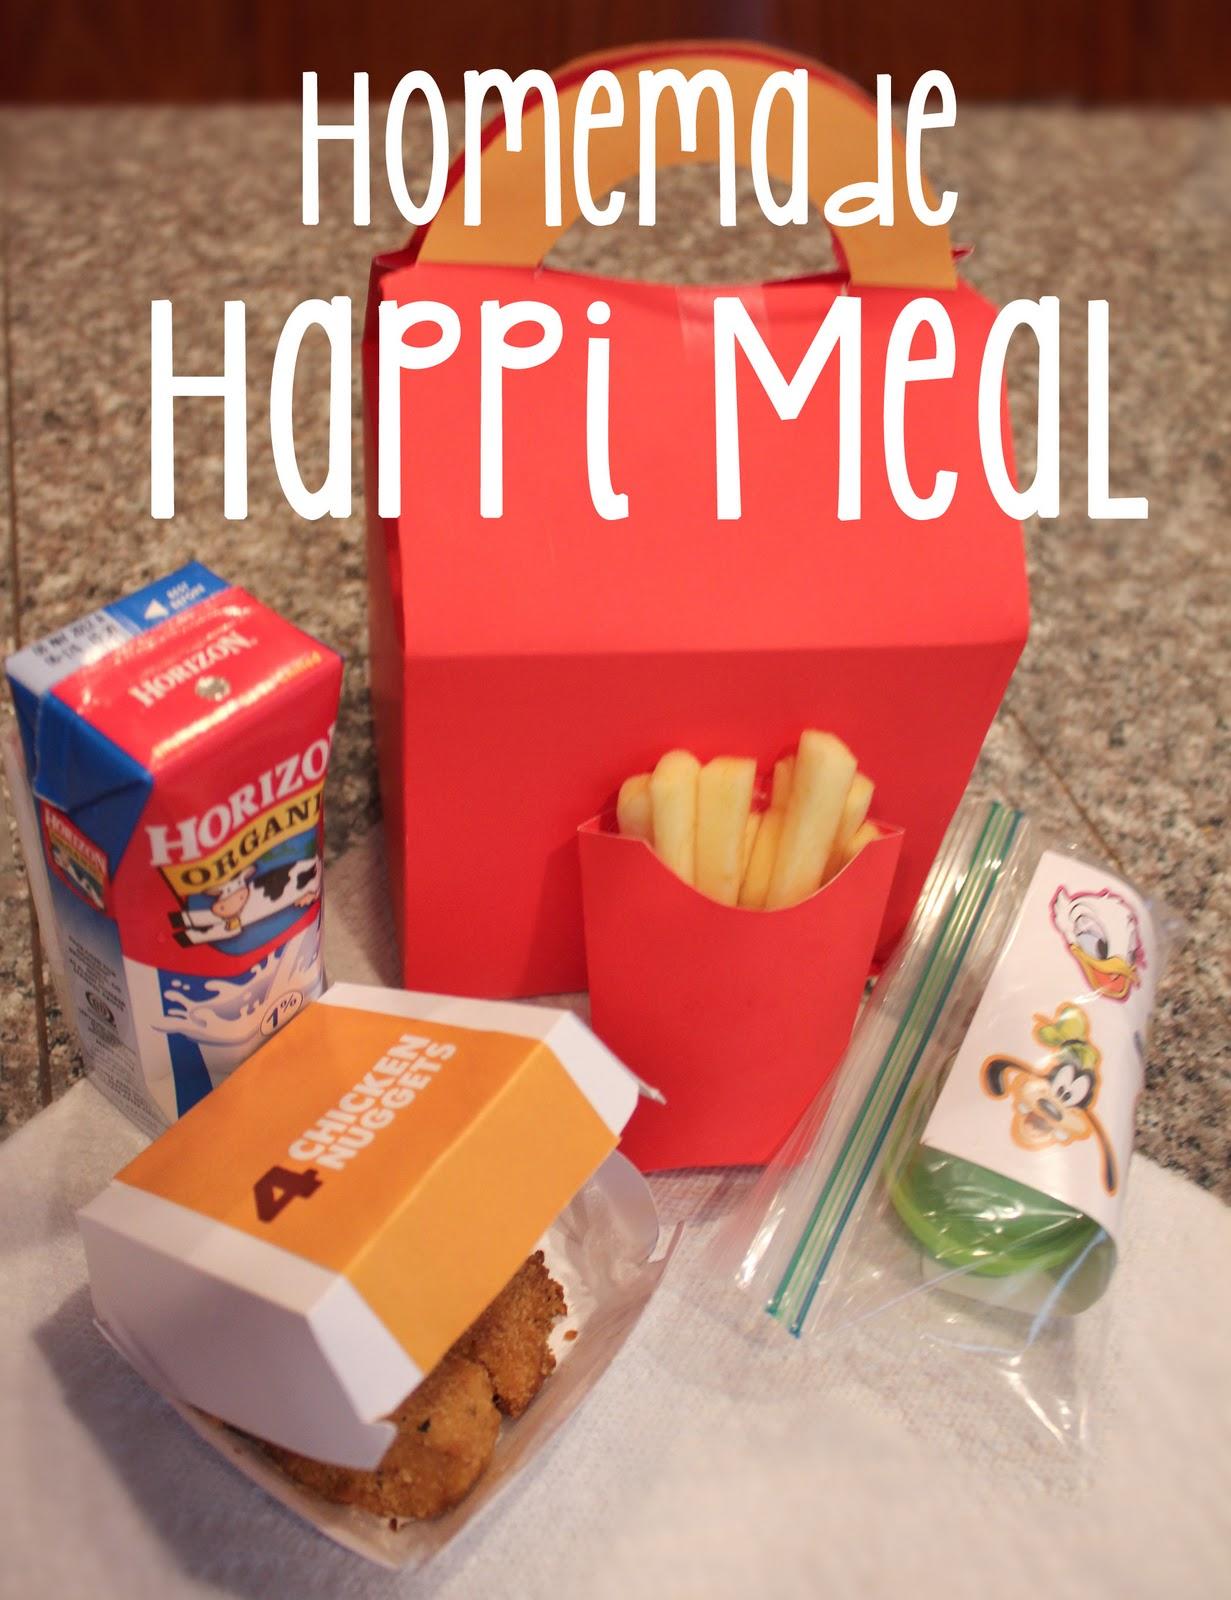 Homemade Happi Meal